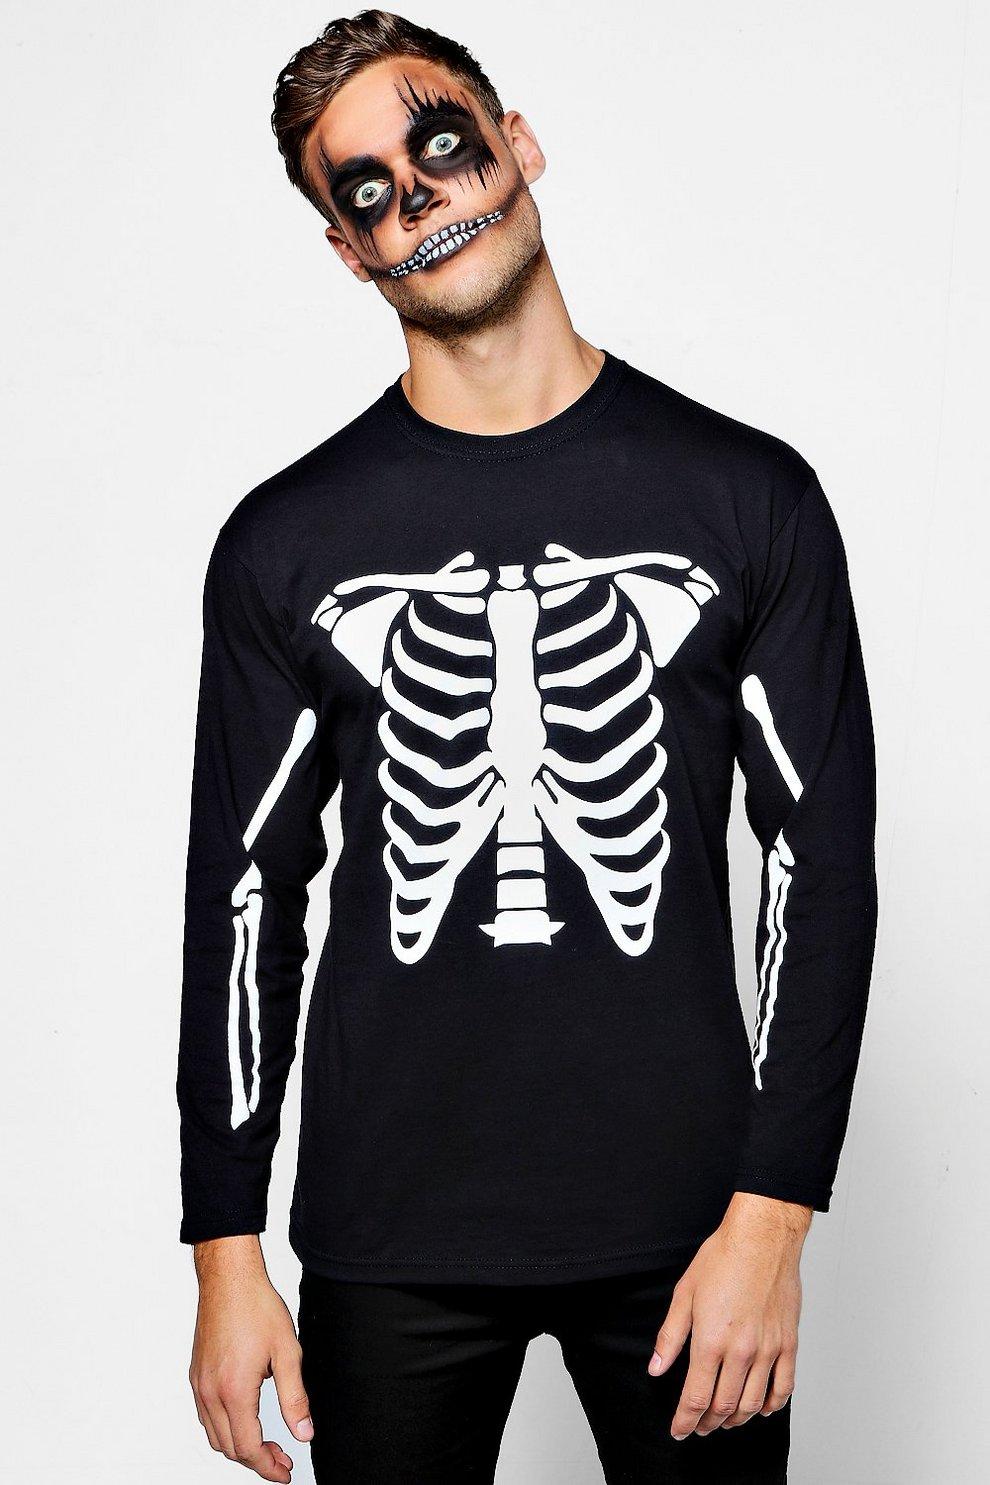 55642650c69 Mens Black Long Sleeve Halloween Skeleton T-Shirt